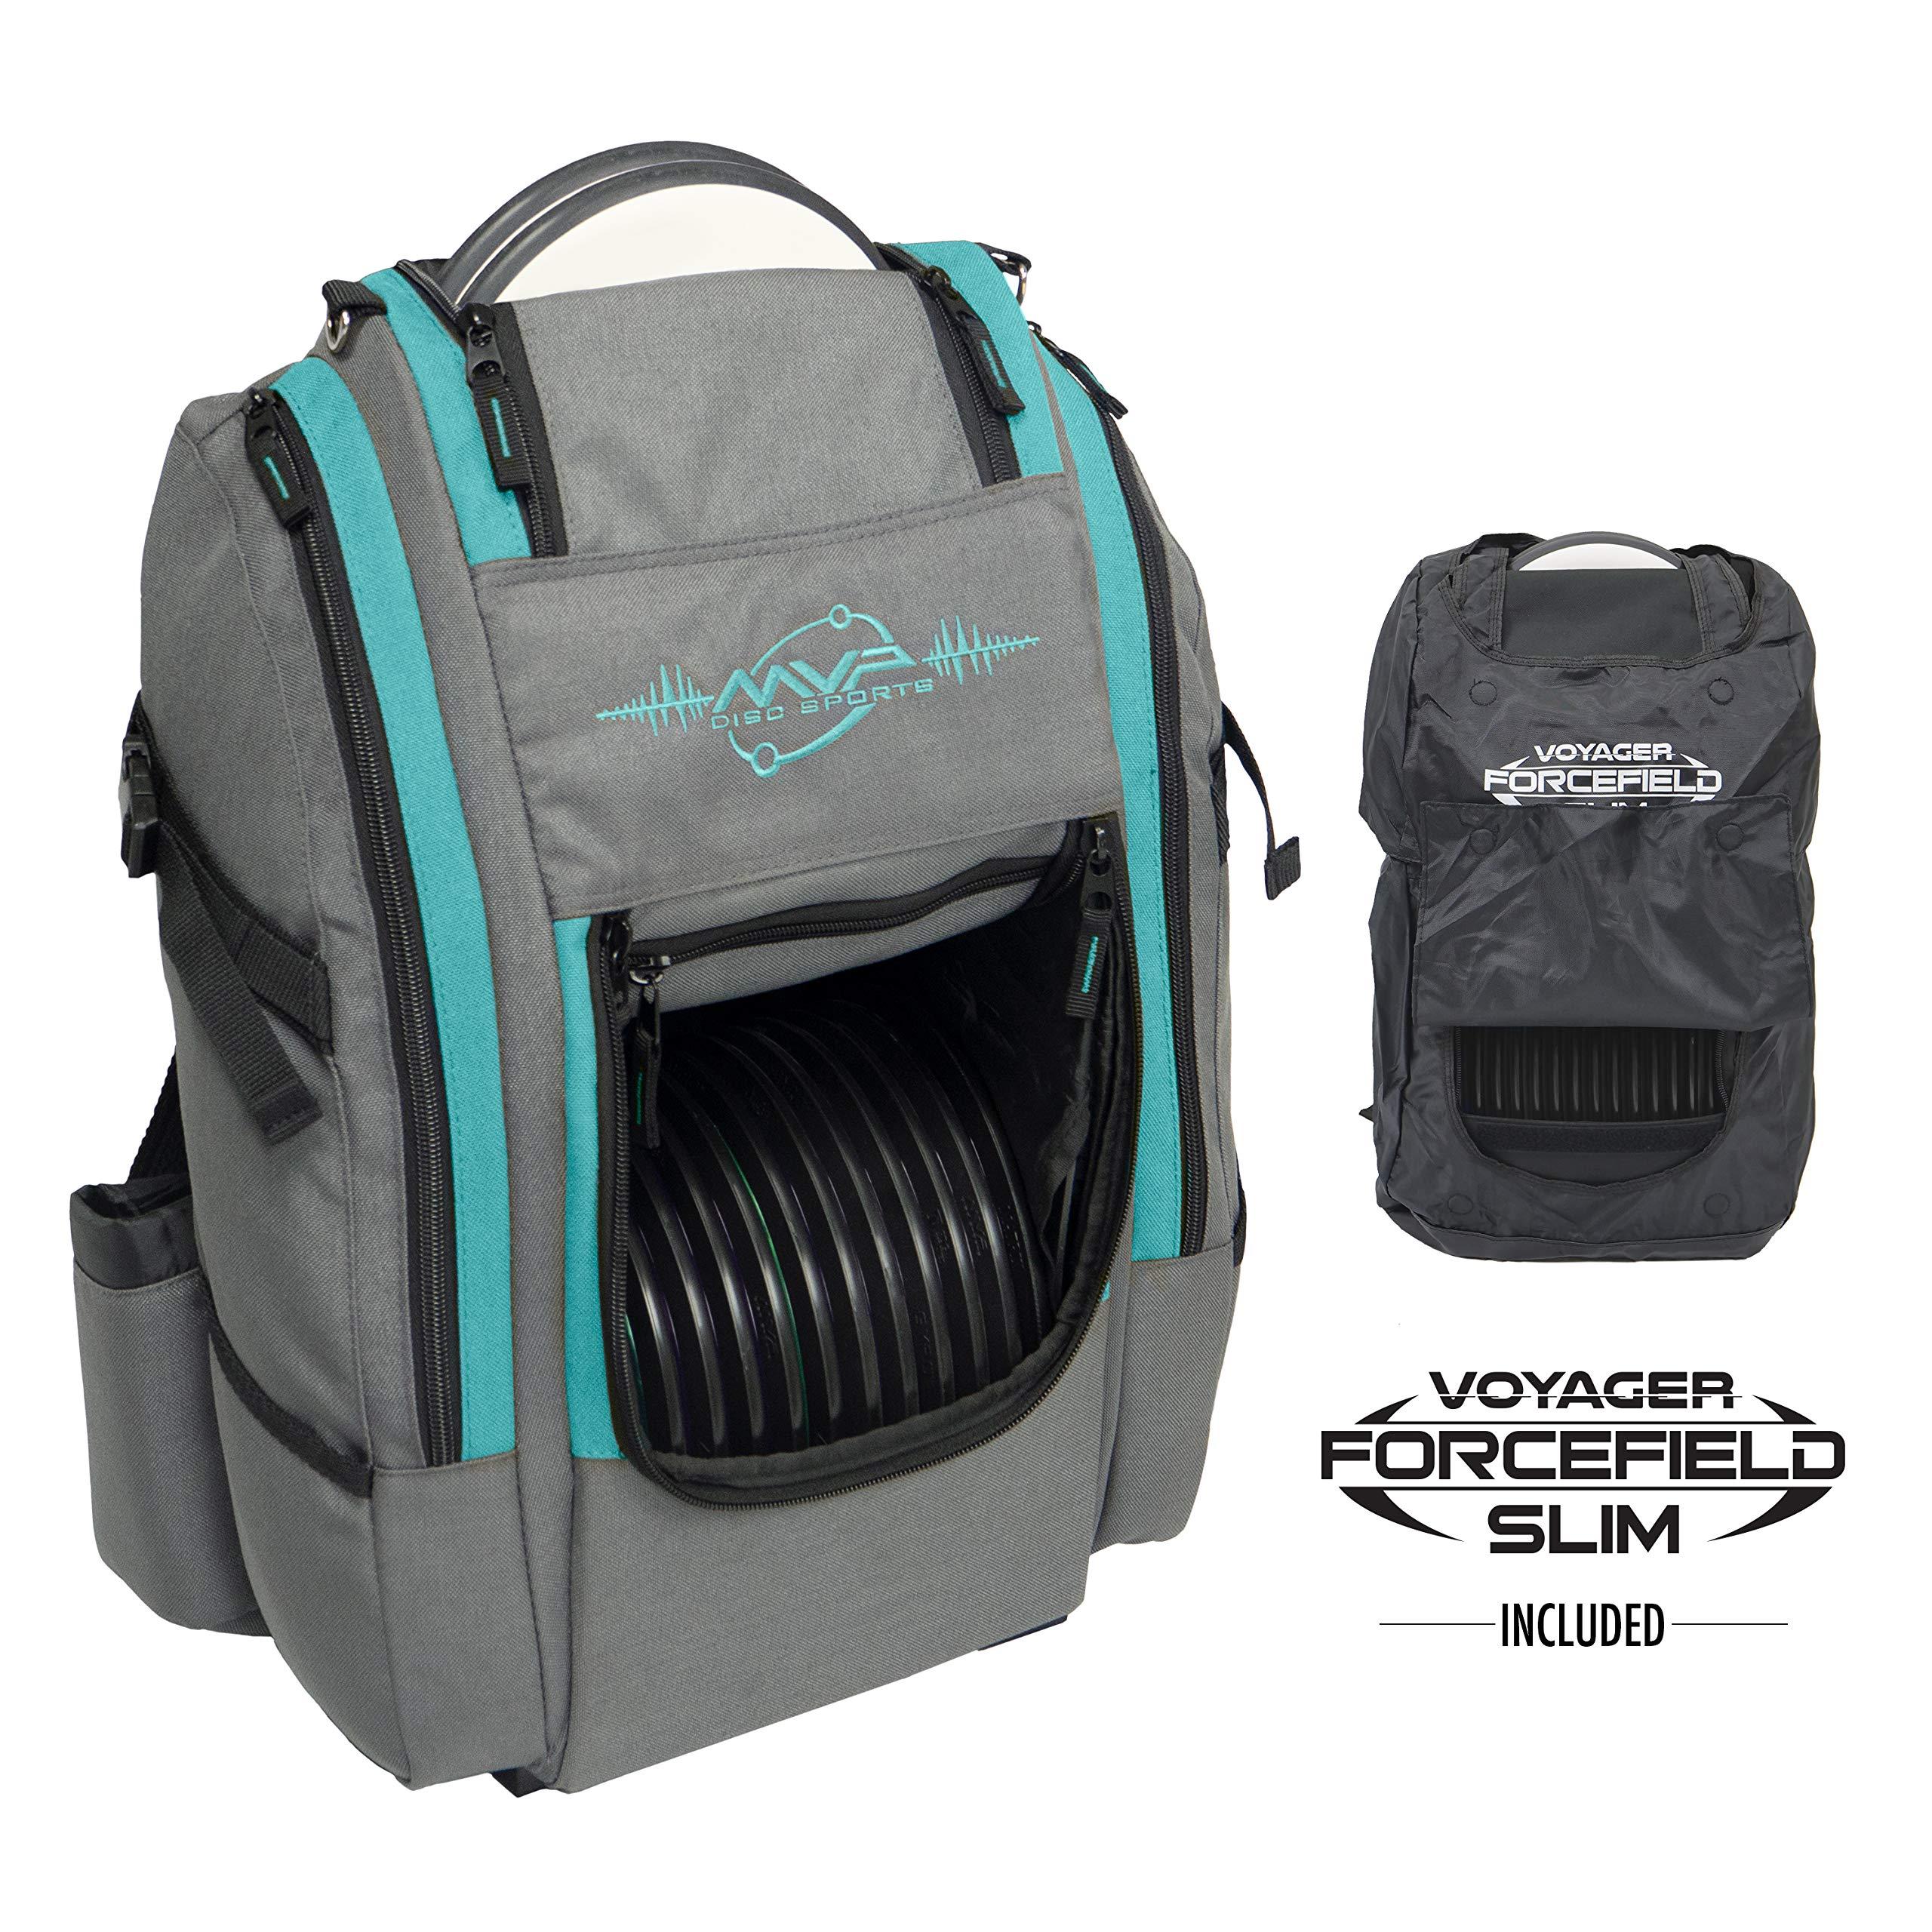 MVP Disc Sports Voyager Slim Bag (Gray/Aqua) + Forcefield by MVP Disc Sports